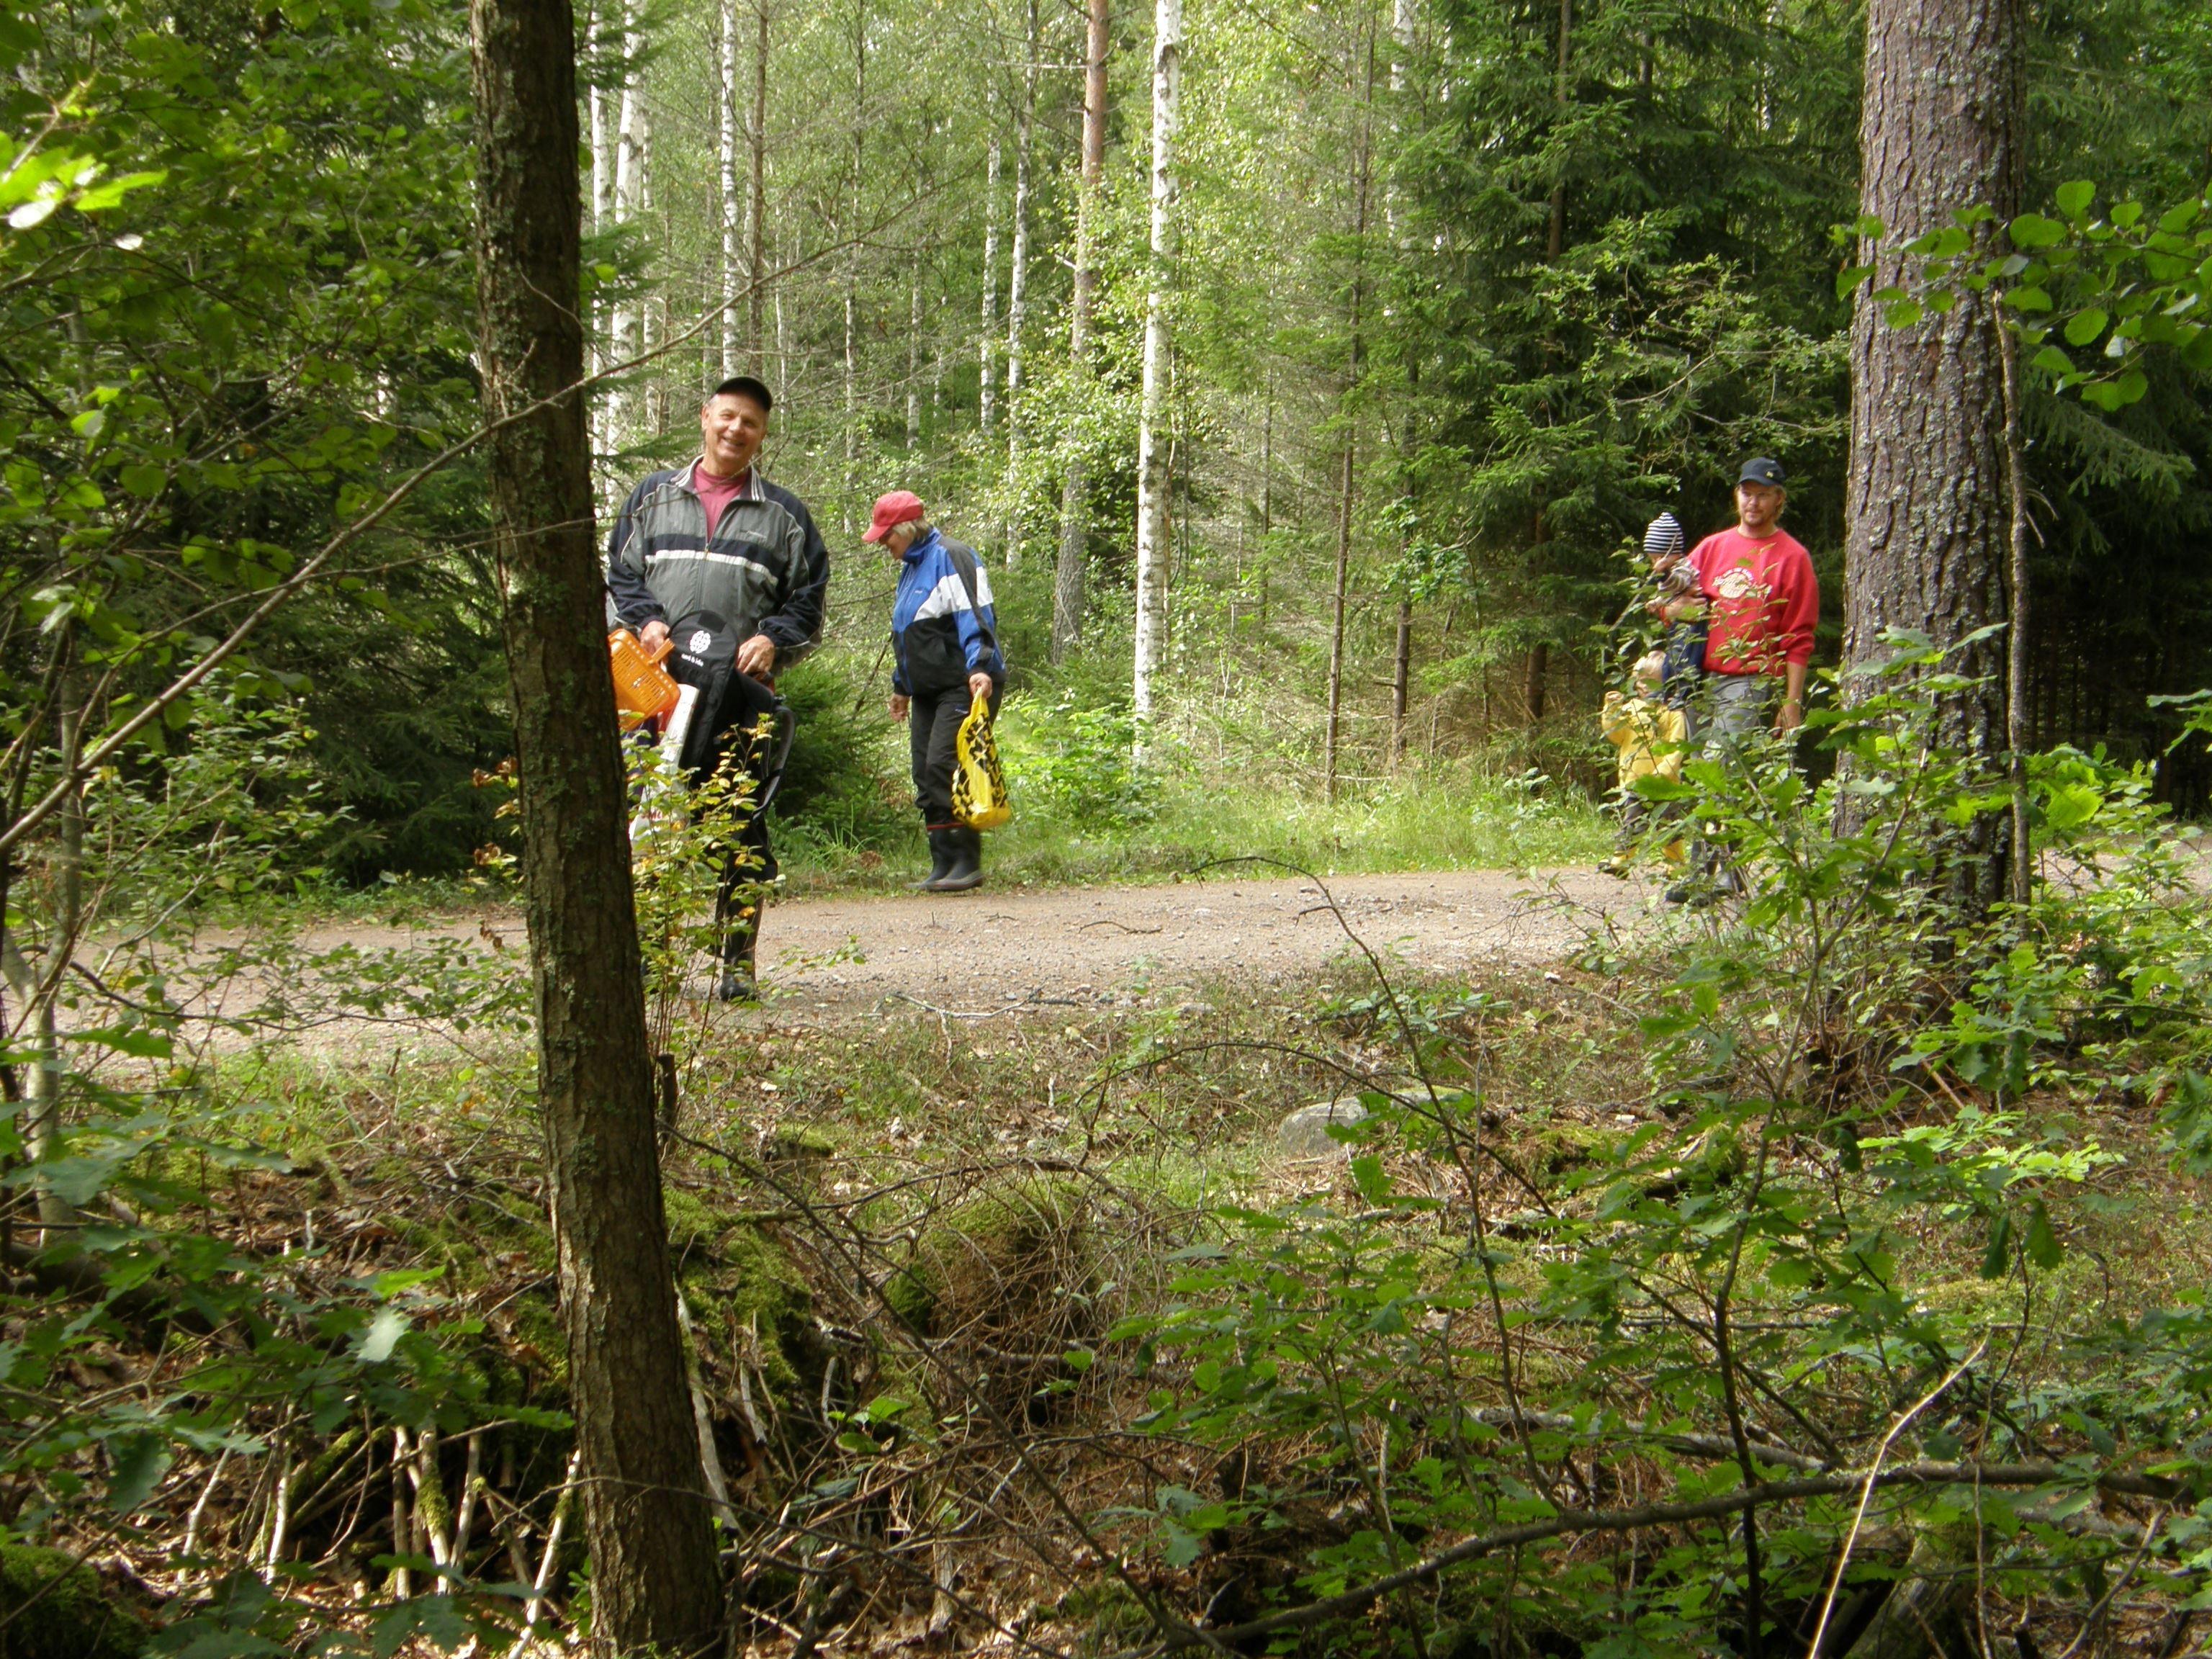 Figeholm jogging trail